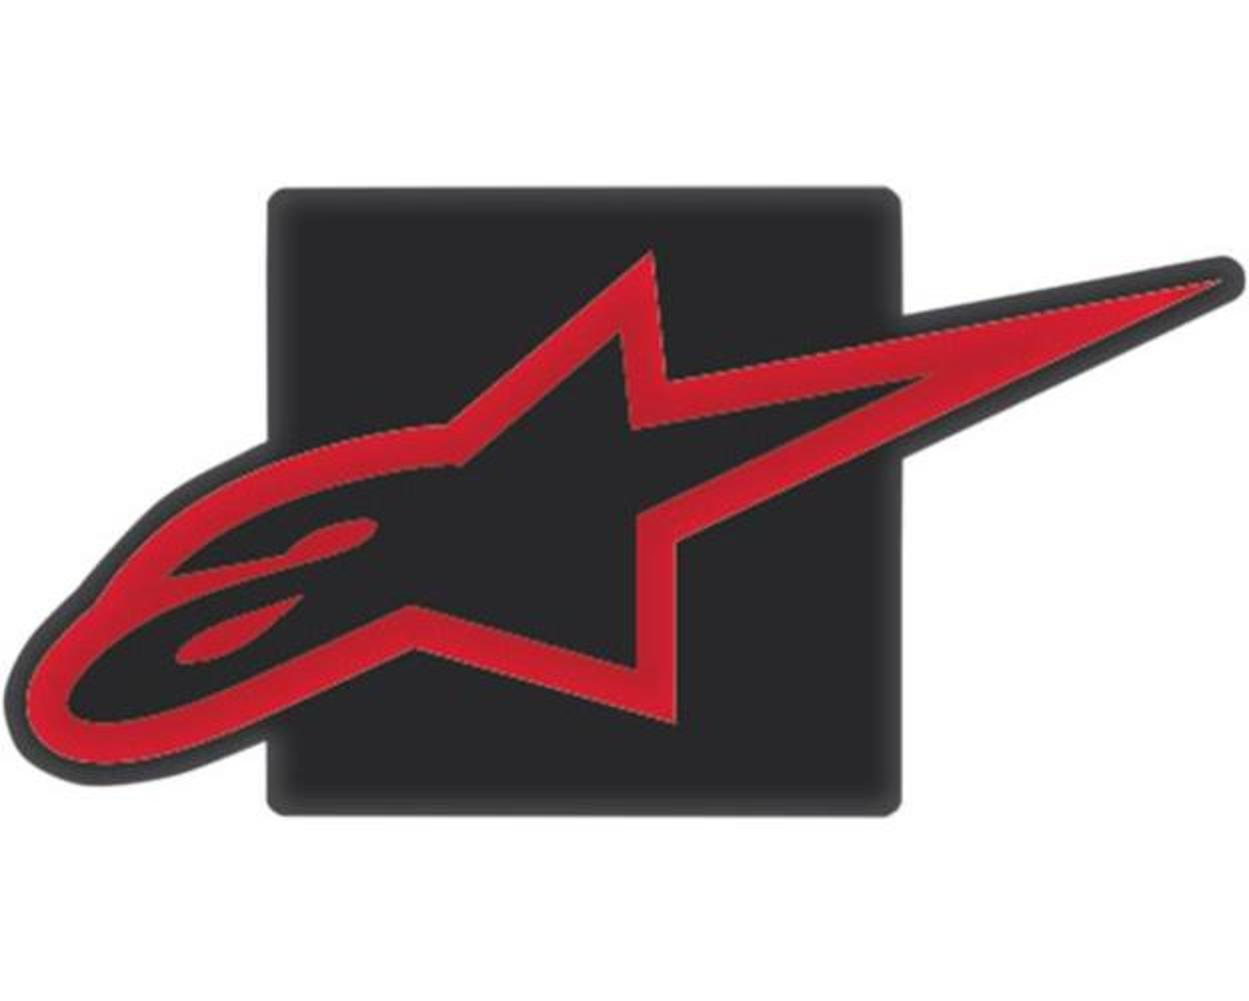 Alpinestars 1037-94000-1030 MX Trailer Hitch Cover Black Red by Alpinestars